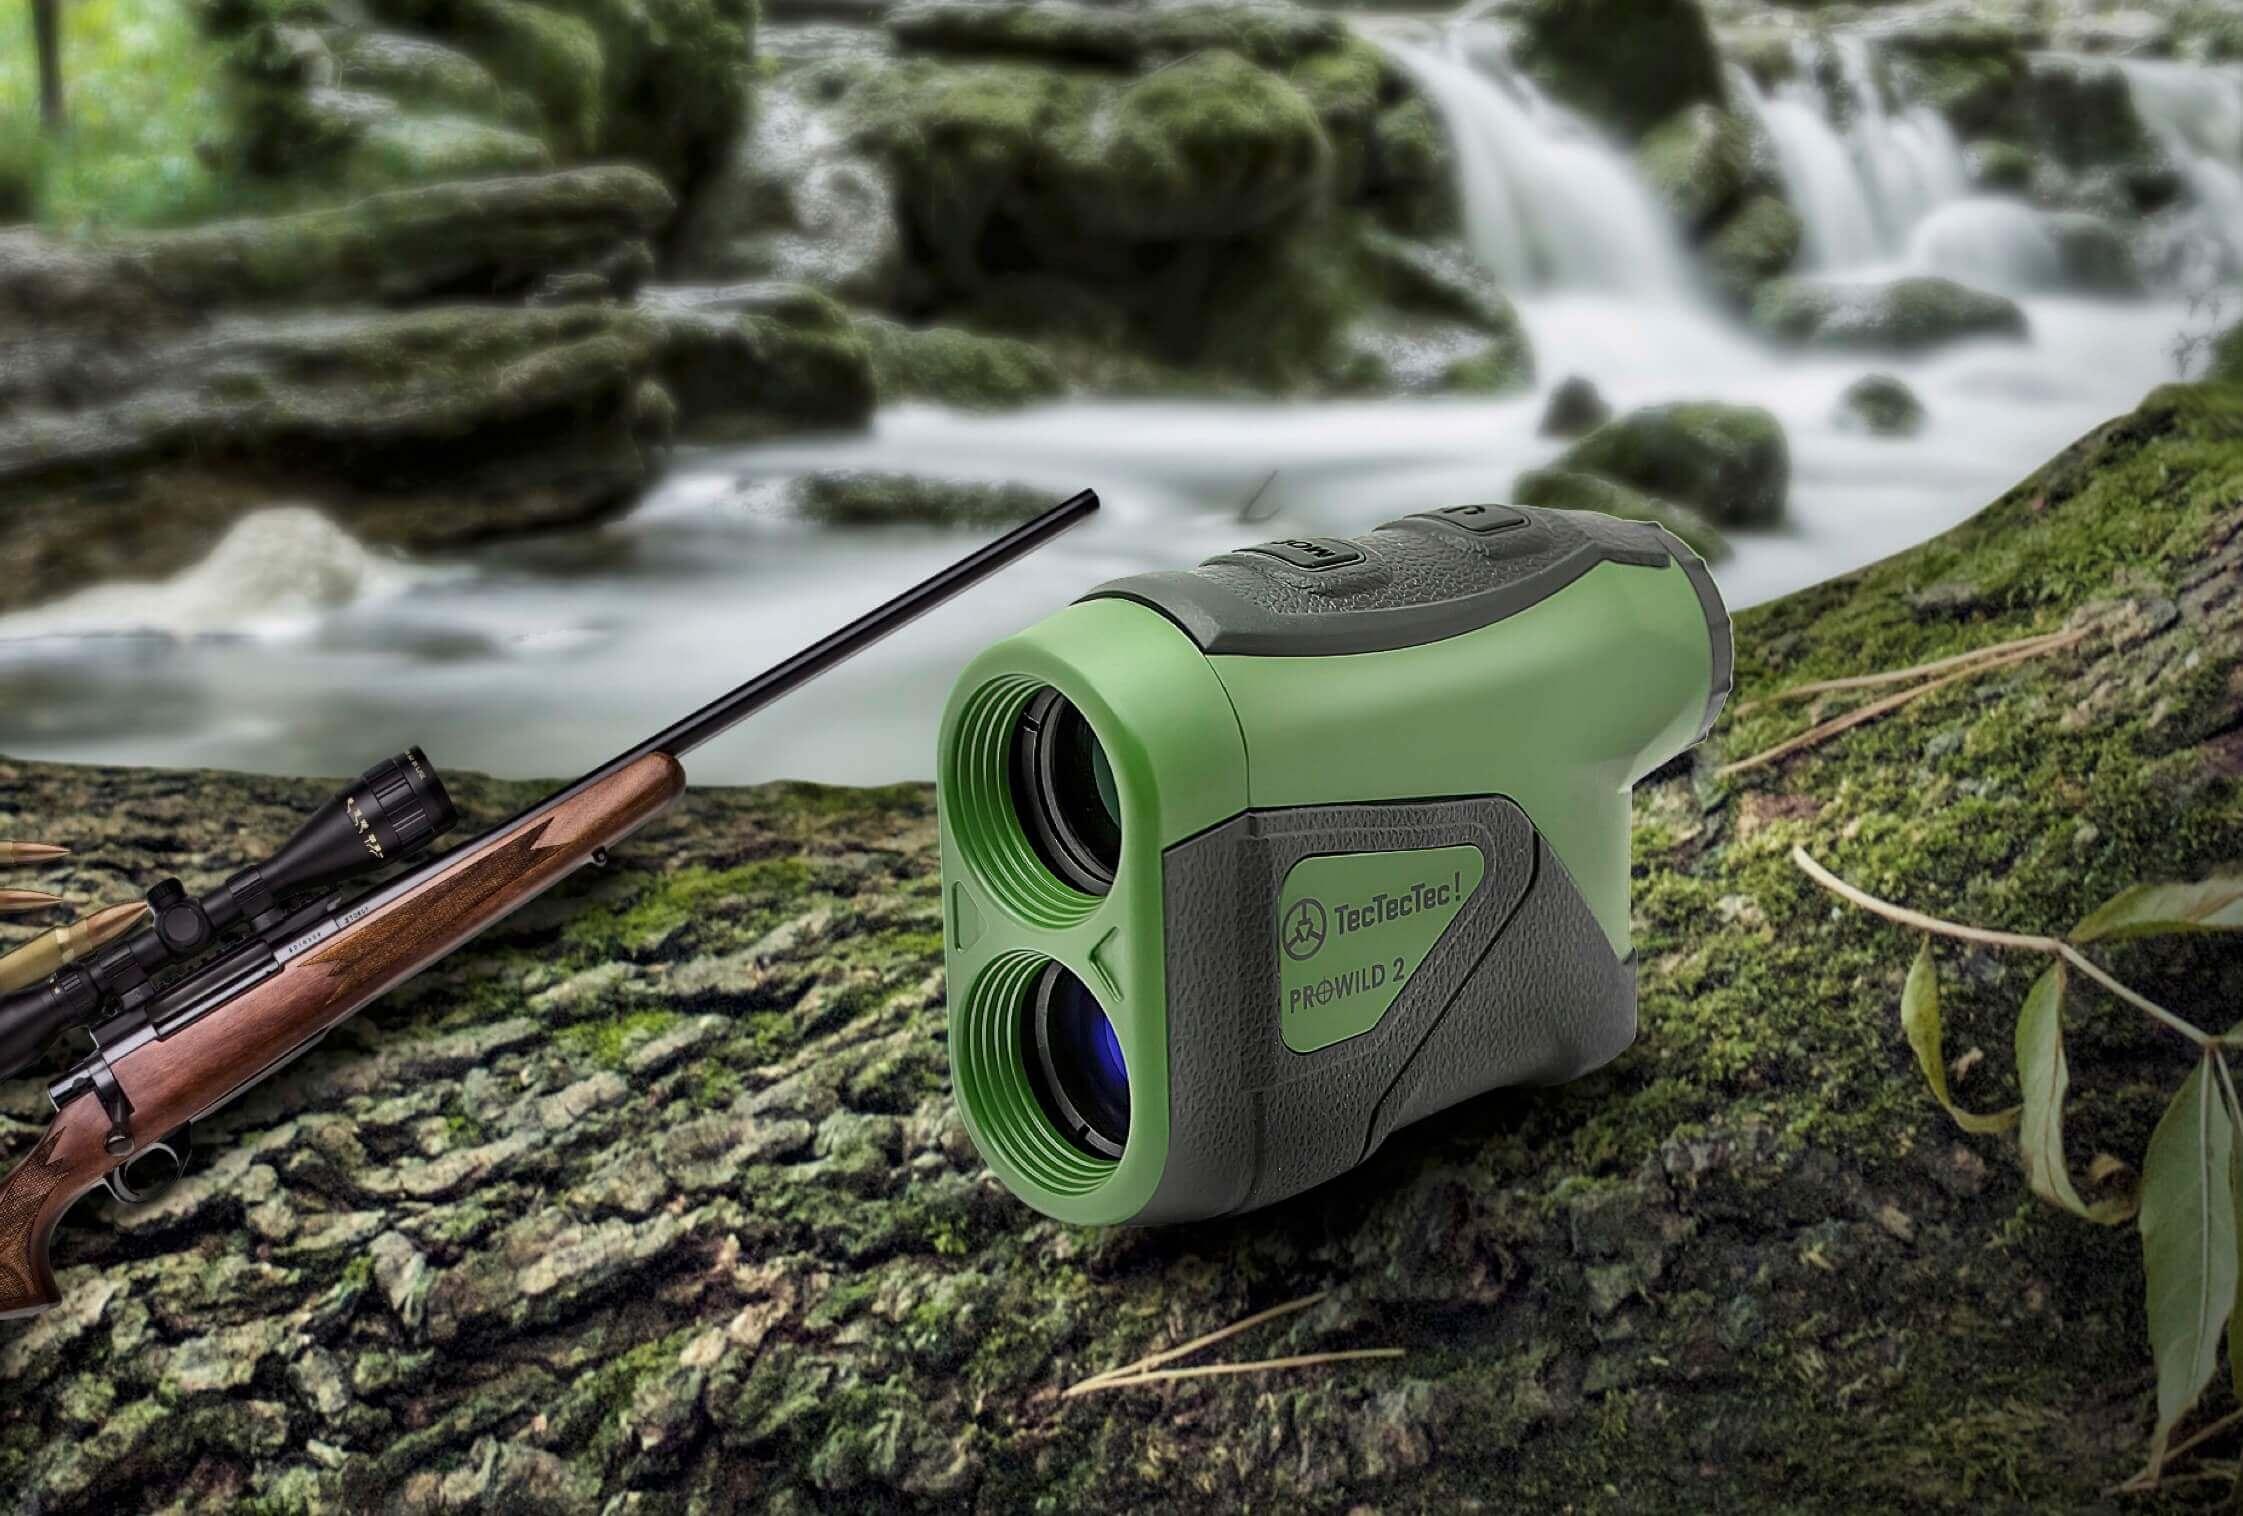 TecTecTec Prowild 2 Hunting rangefinder 0.3 Accuracy